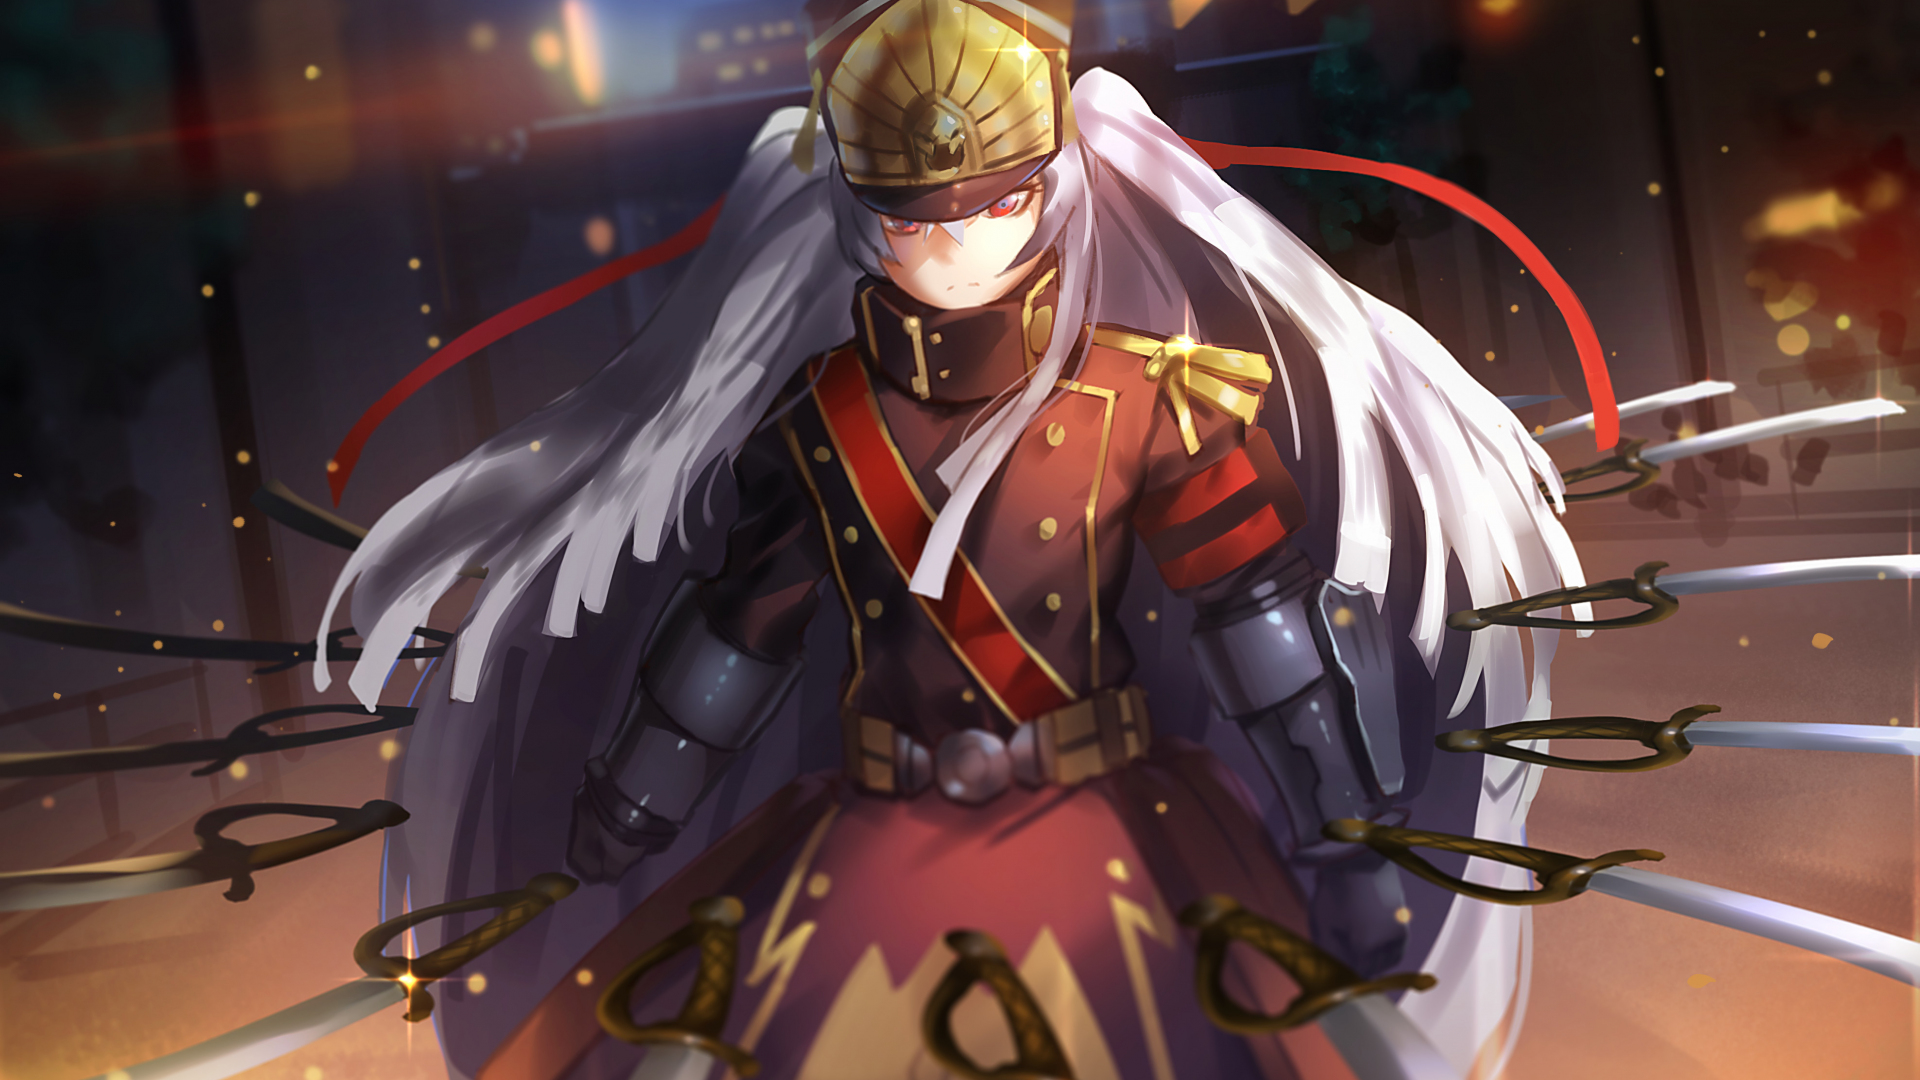 Download 1920x1080 Wallpaper Altair Re Creators Anime Girl Army